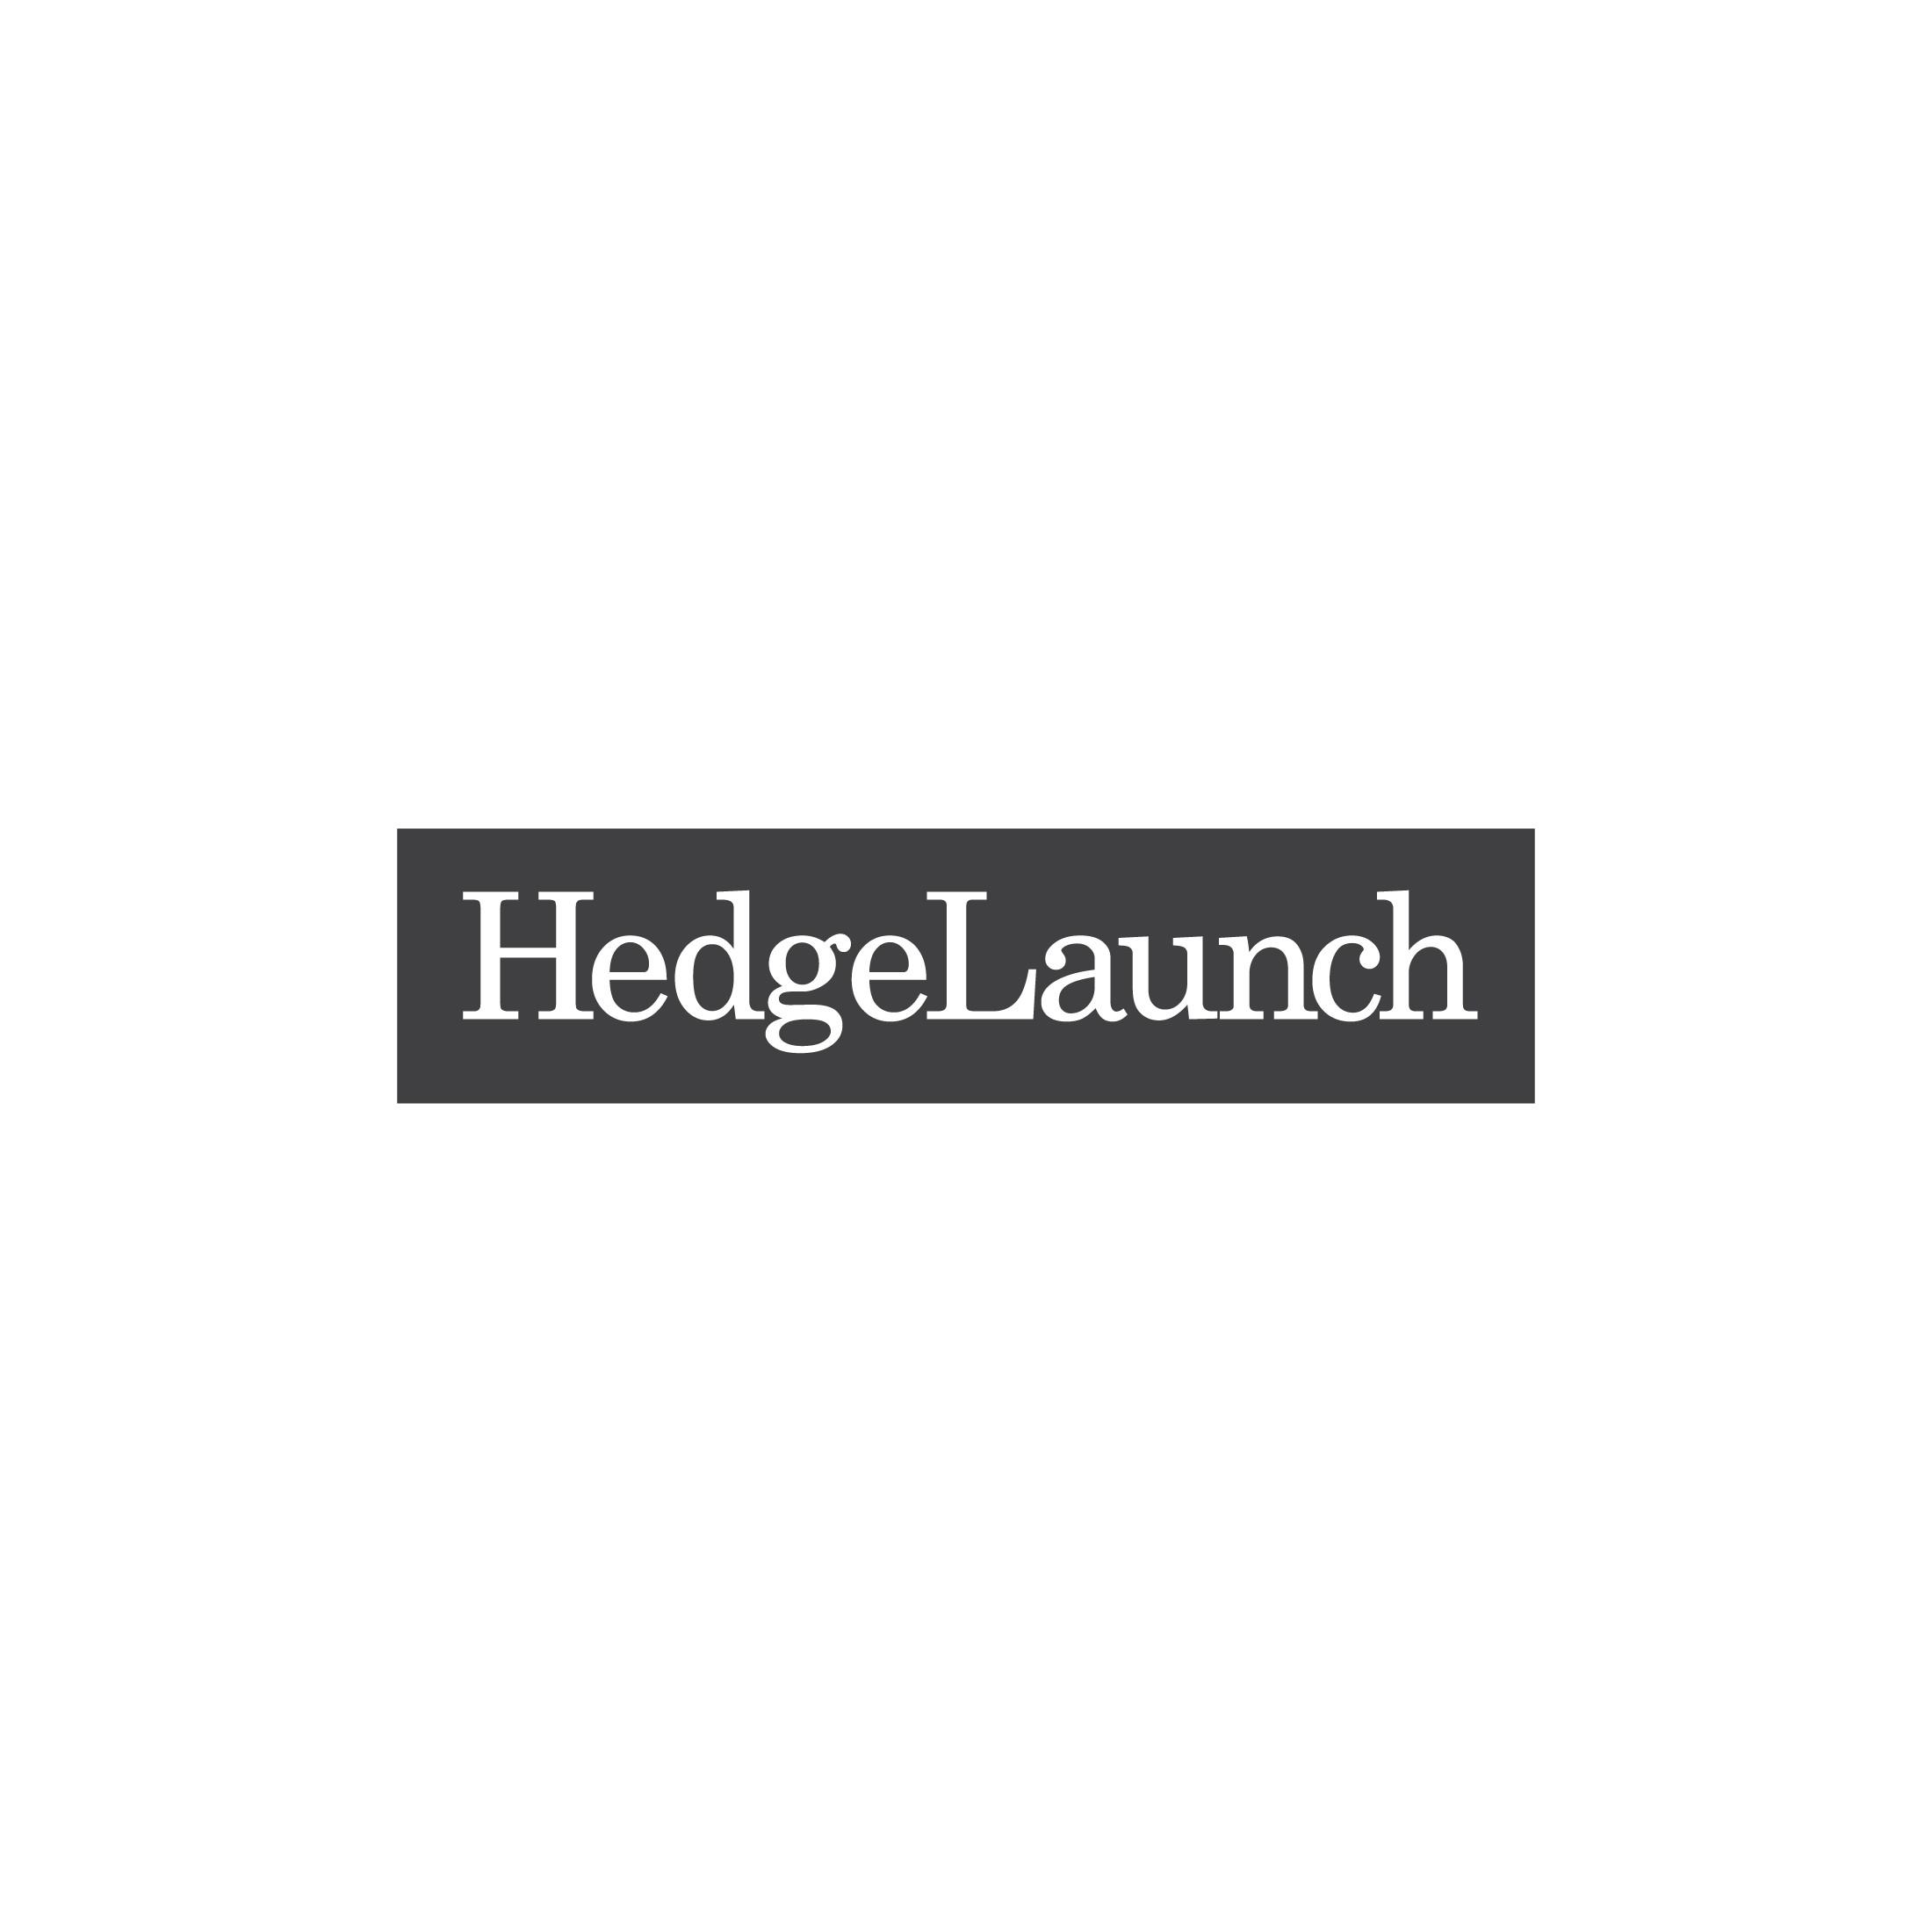 HedgeLaunch